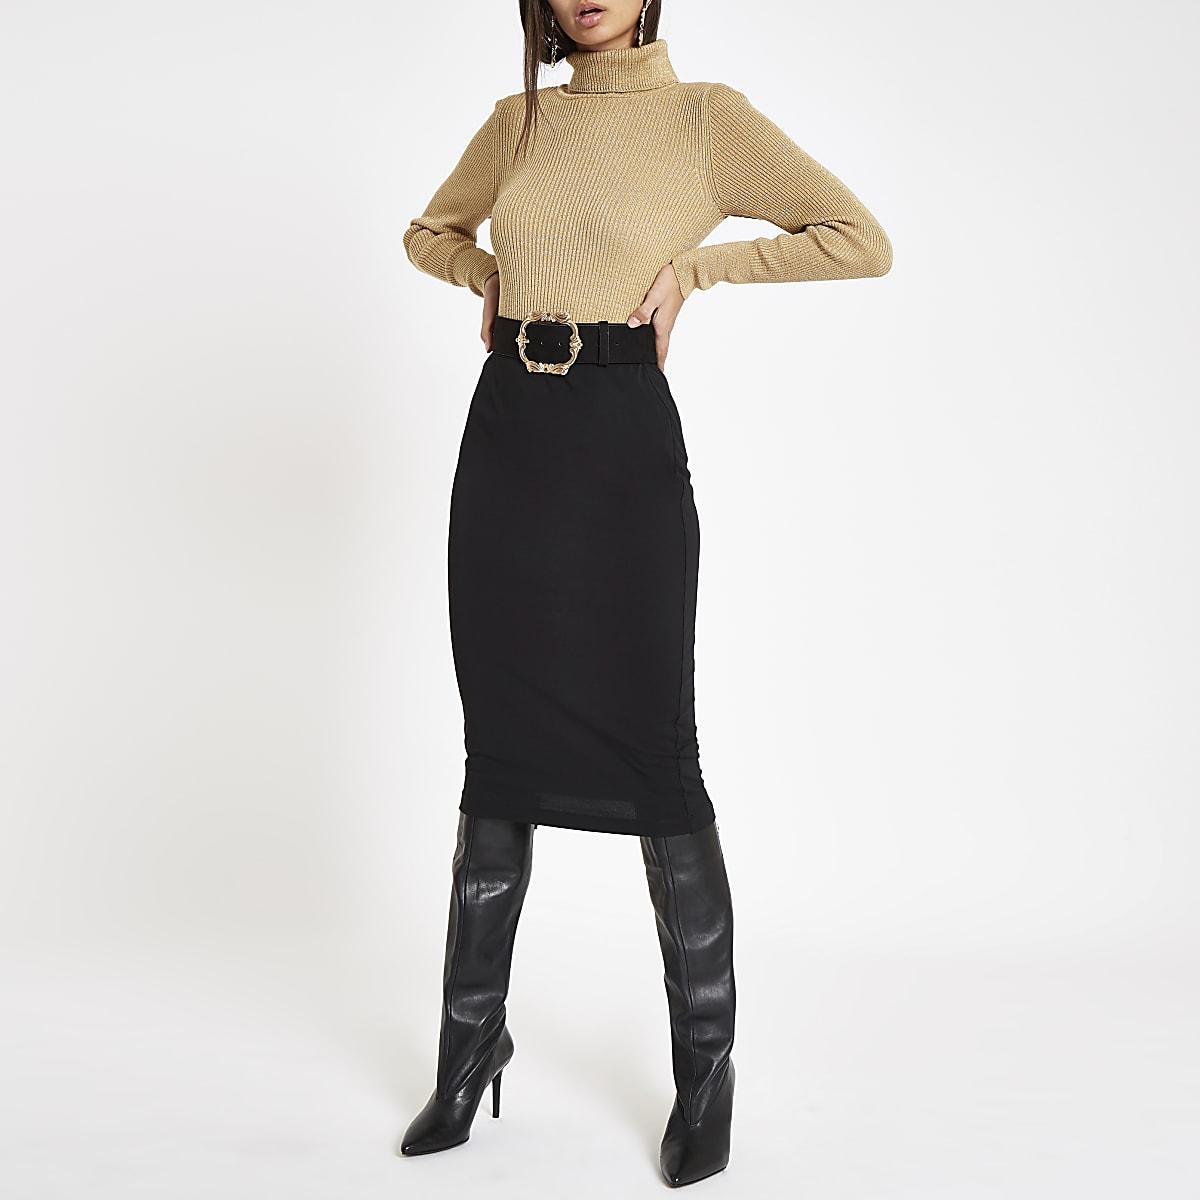 57fbfc458c44df Black jersey pencil skirt